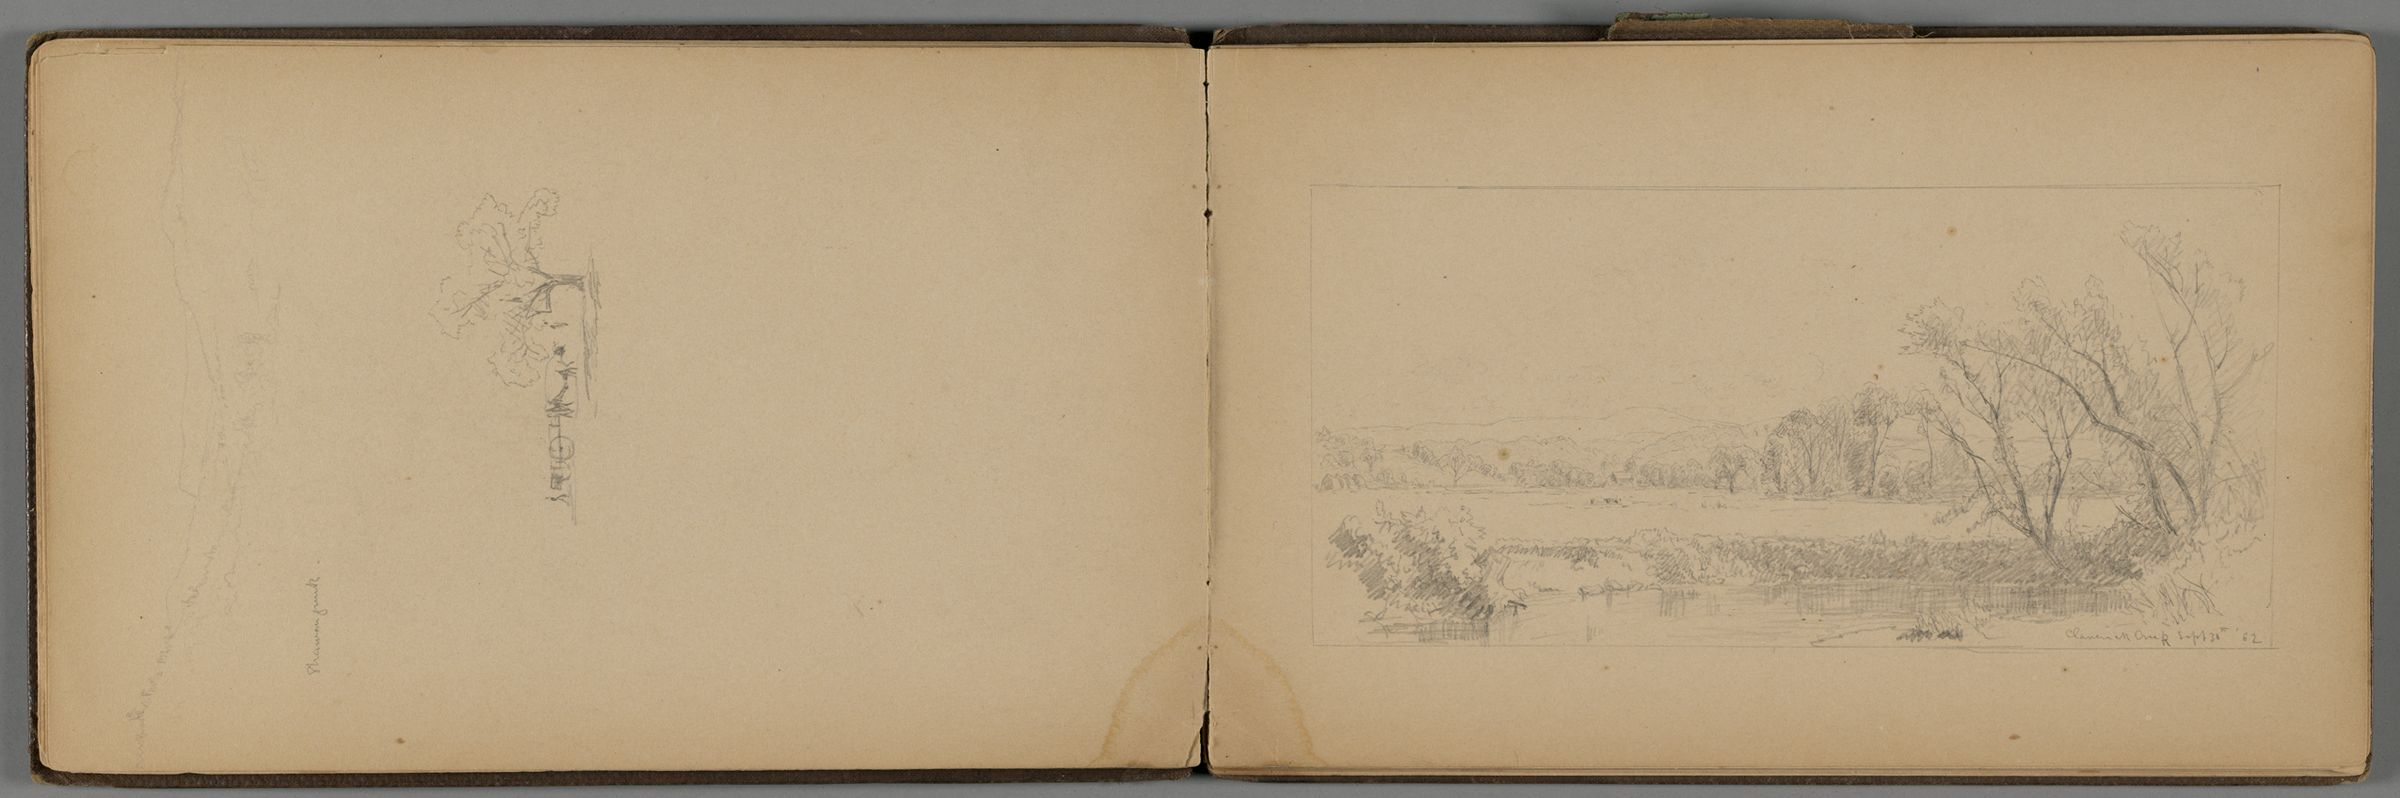 Claverack Creek, New York; Verso: Partial Landscape